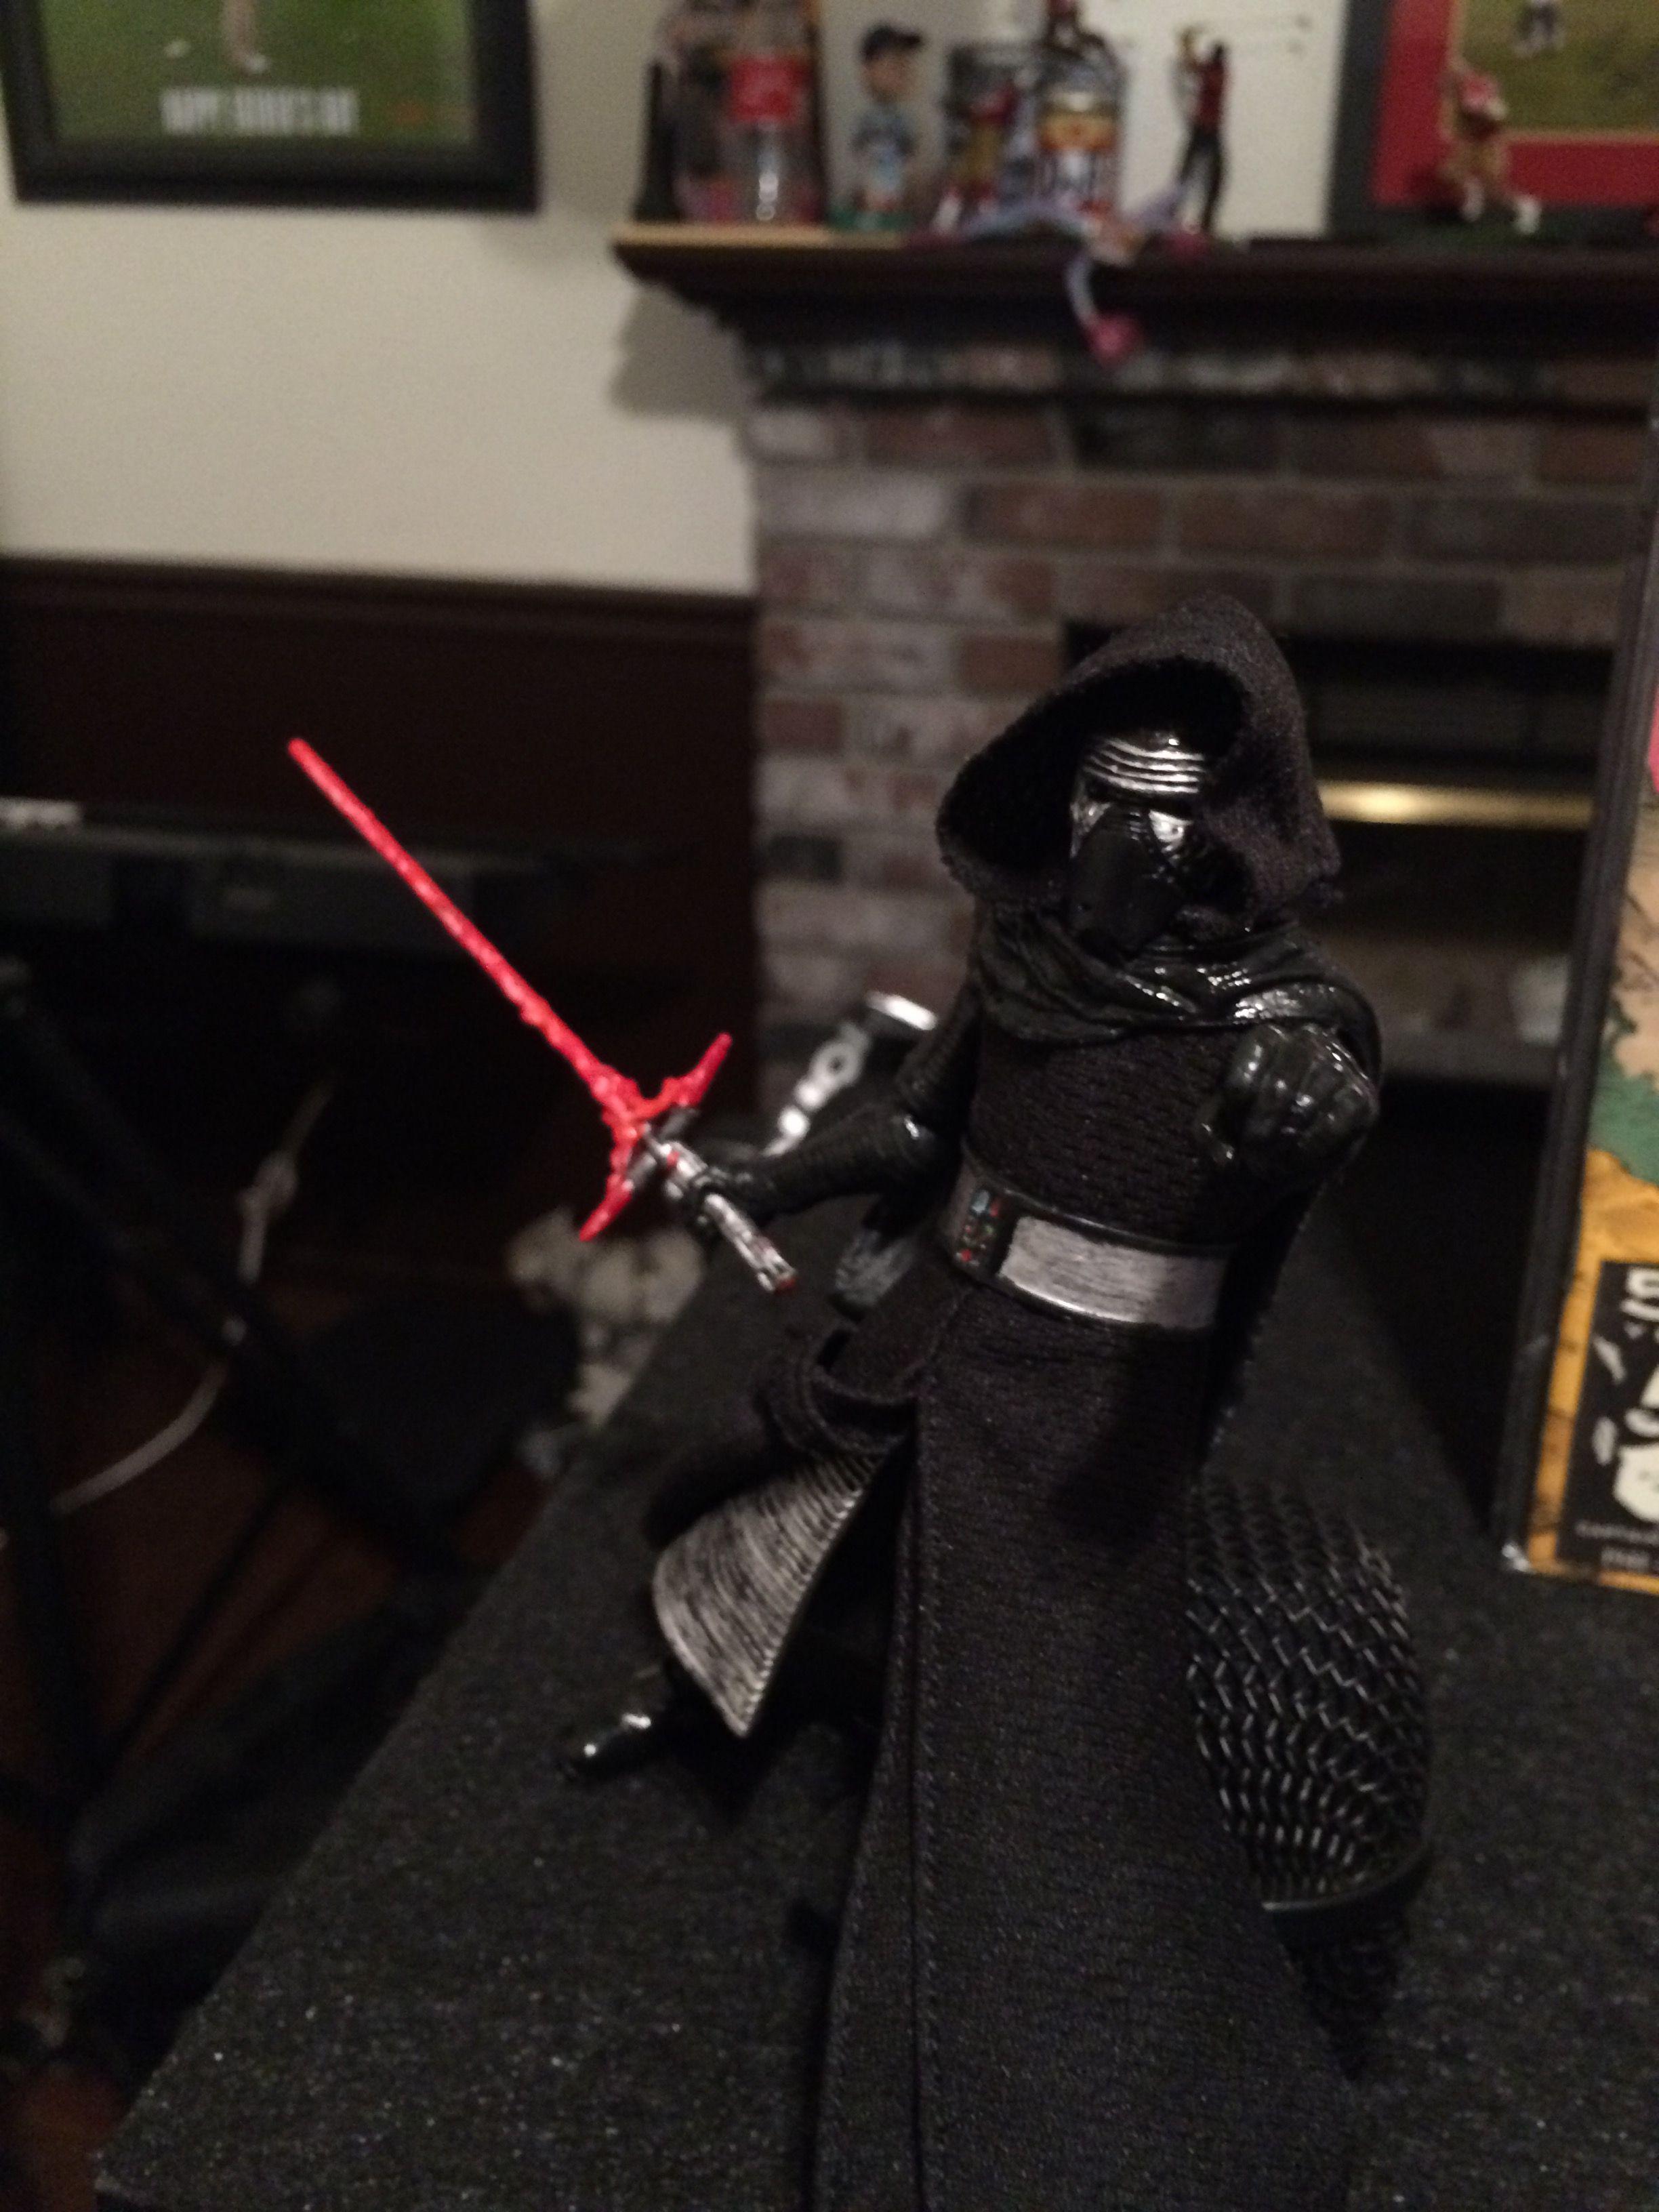 ec0d671435e99b My latest Custom Star Wars Black Series 6 inch Kylo Ren The Force Awakens  Figure.